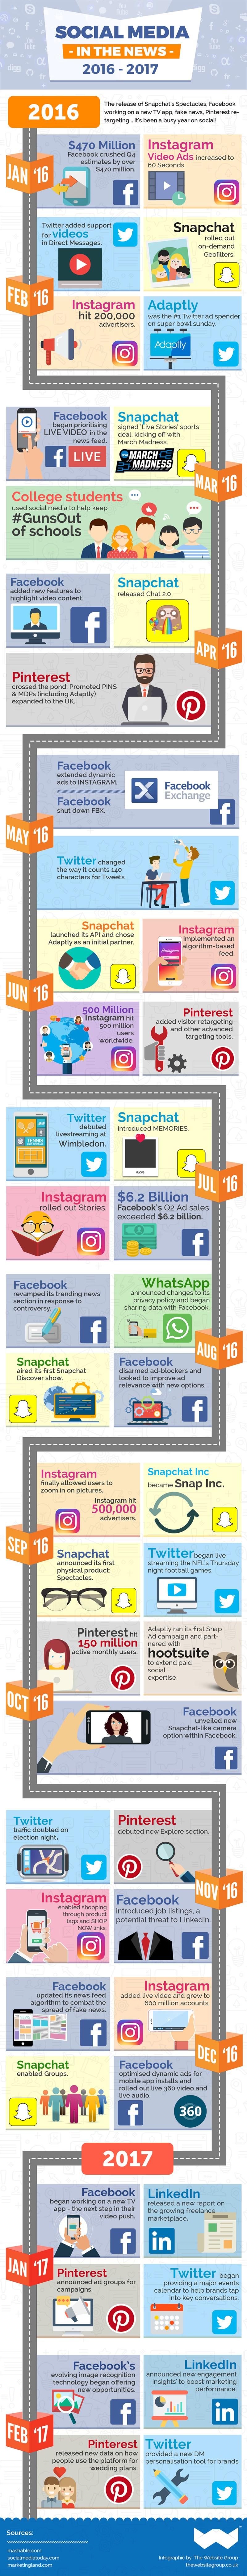 Social Media in the News 2016 – 2017 [Infographic] | Social Media Today